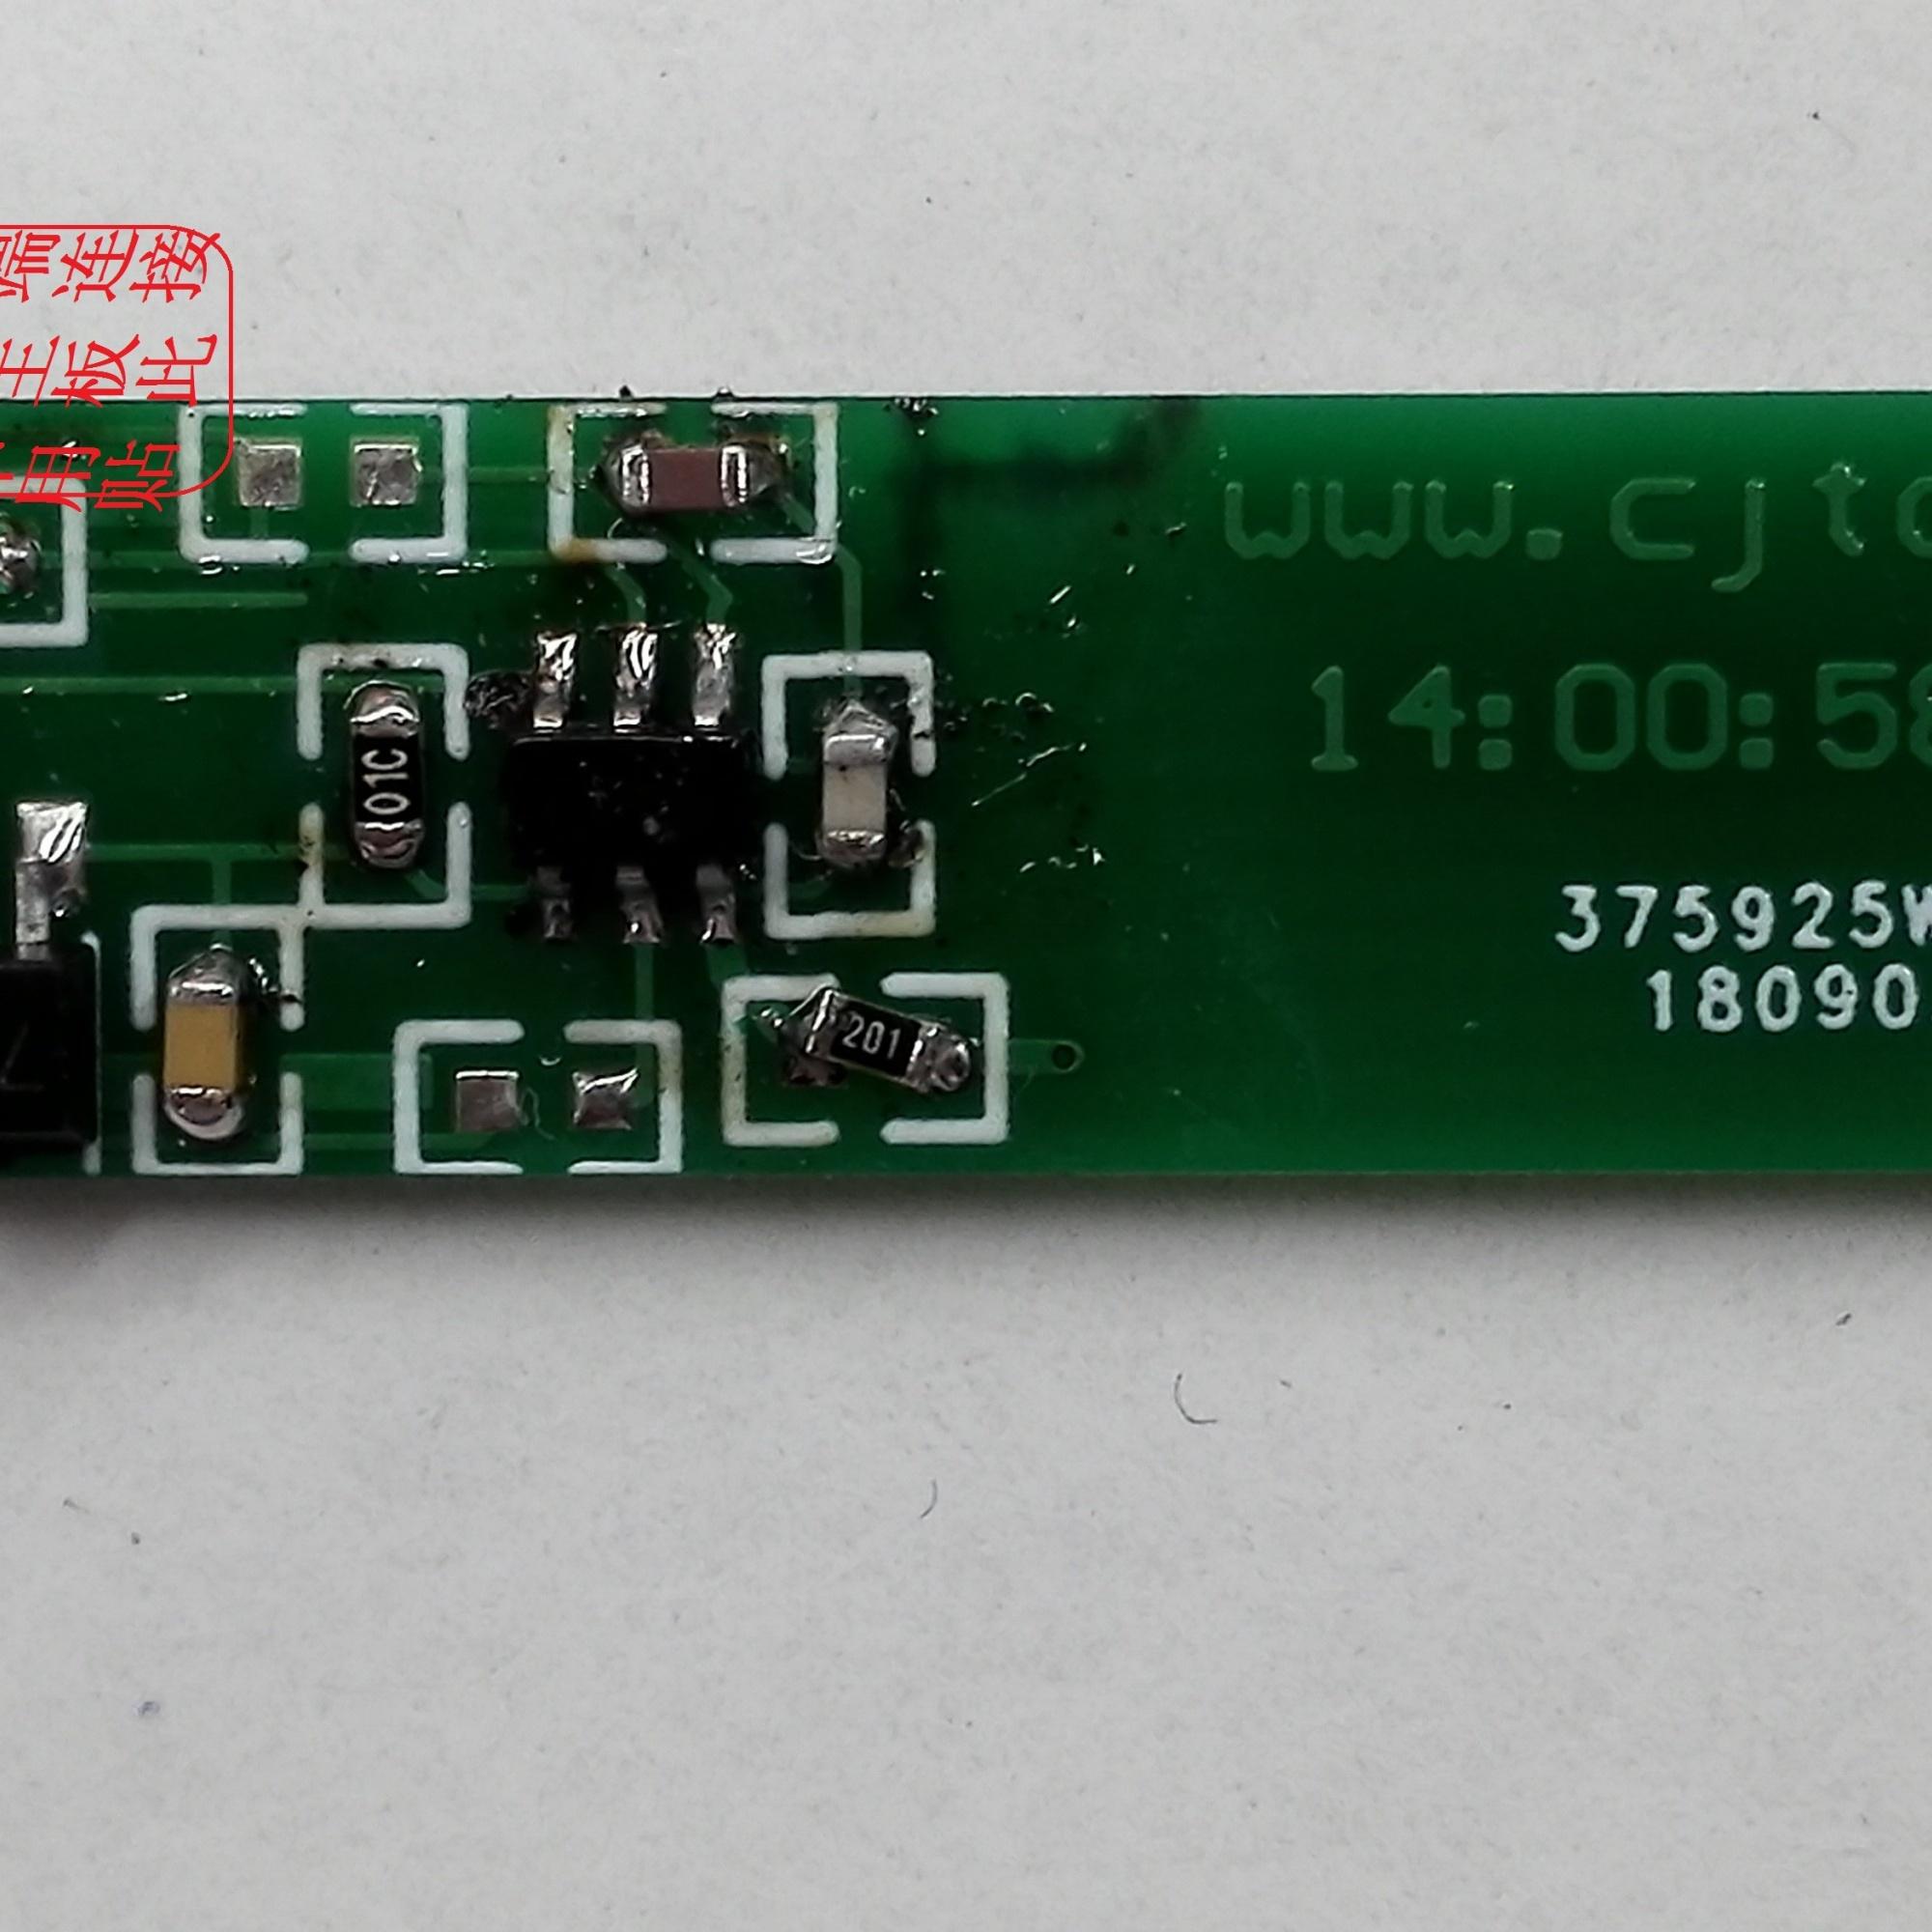 CSW01非接触液体的液体检测芯片技术方案